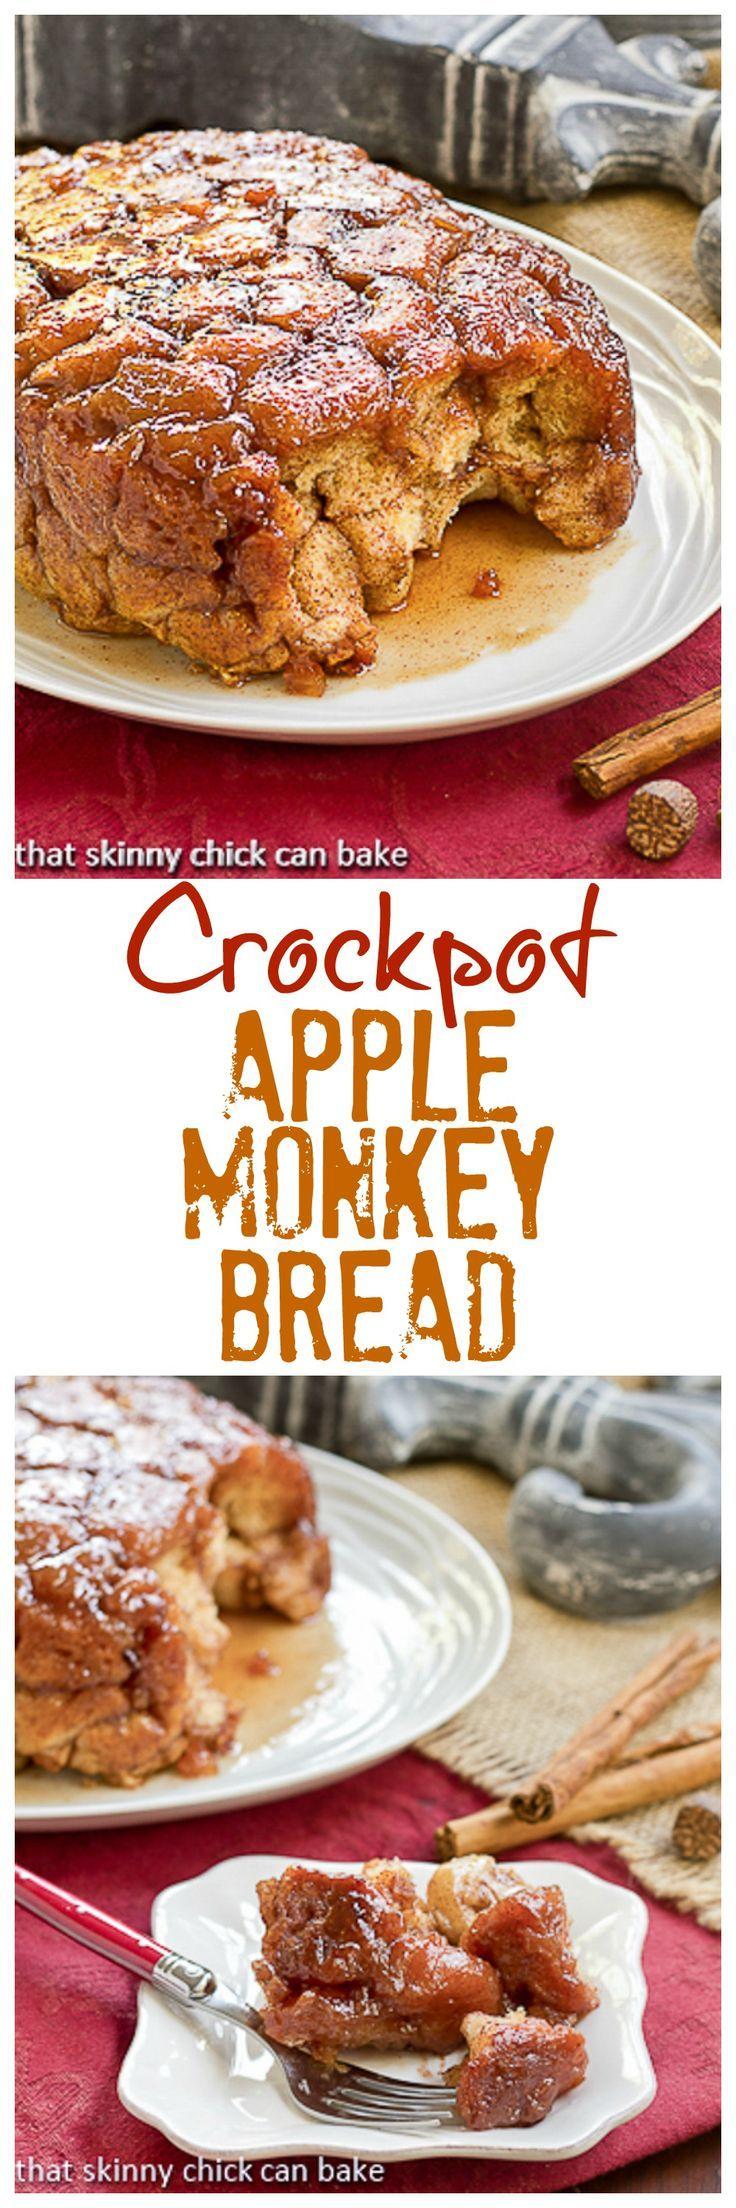 Apple Monkey Bread | Super easy, irresistible breakfast made in the crockpot @lizzydo